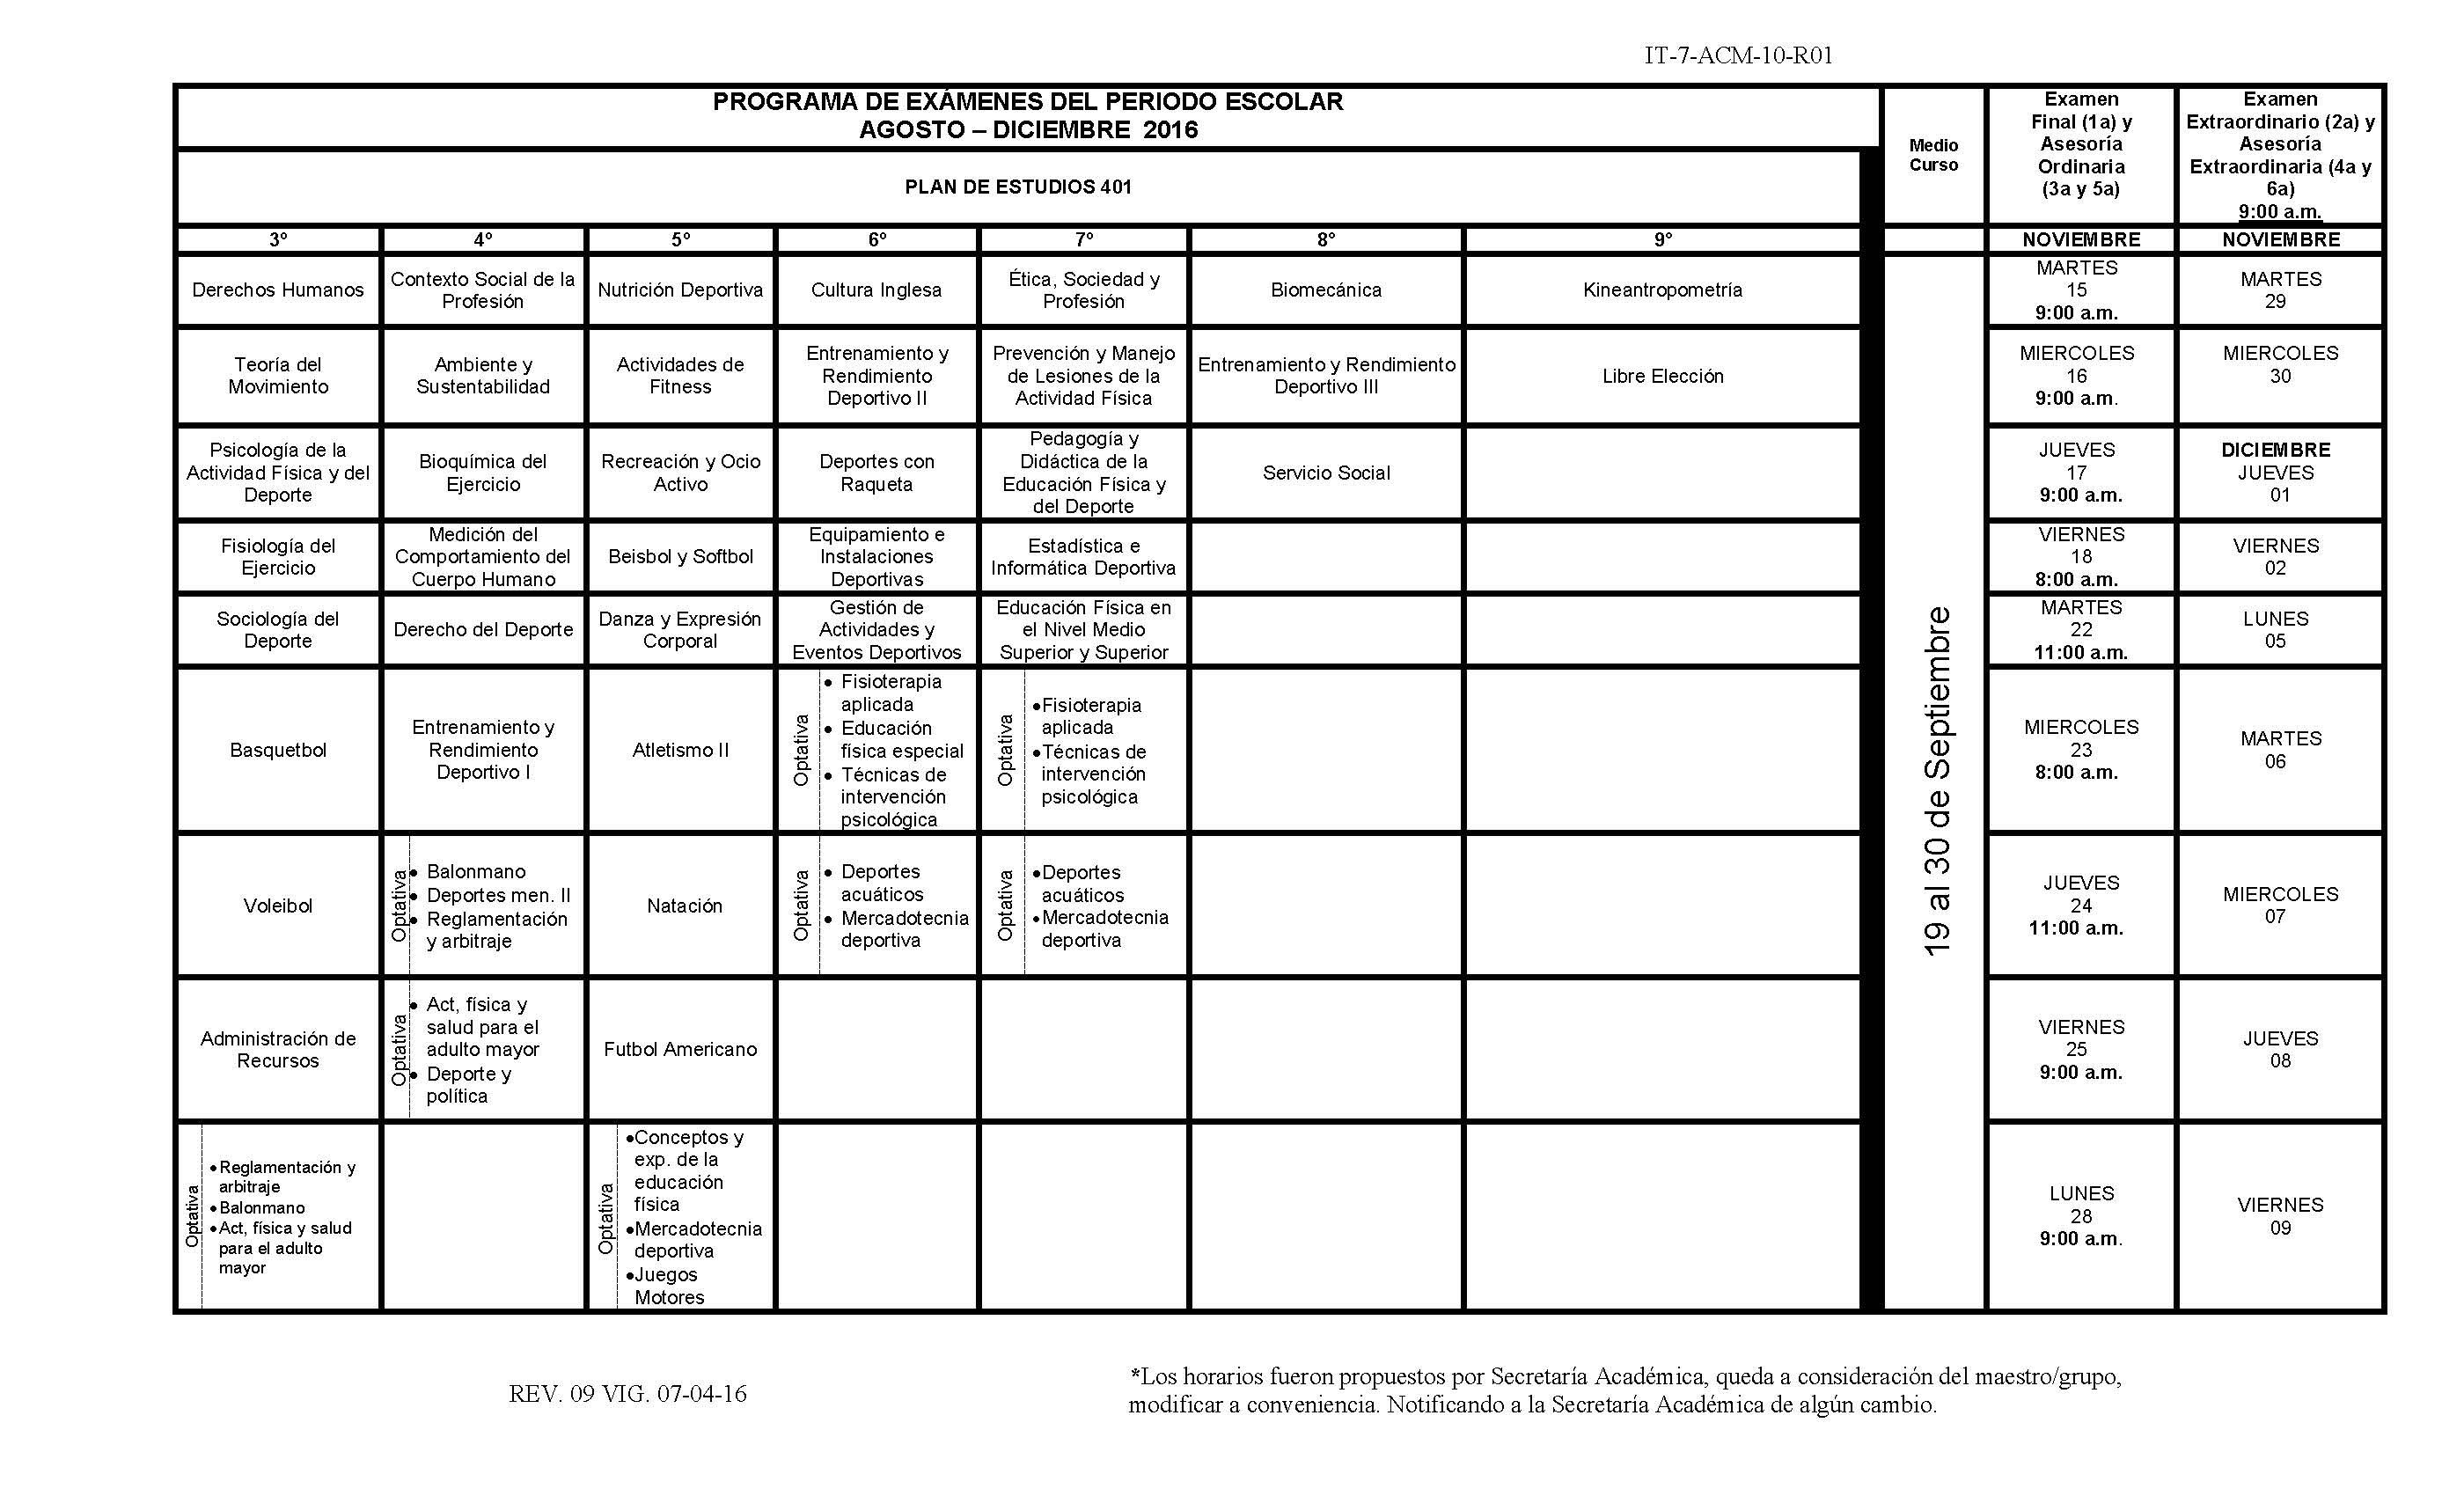 calendario-de-examenes-ago-dic-2016_pagina_1